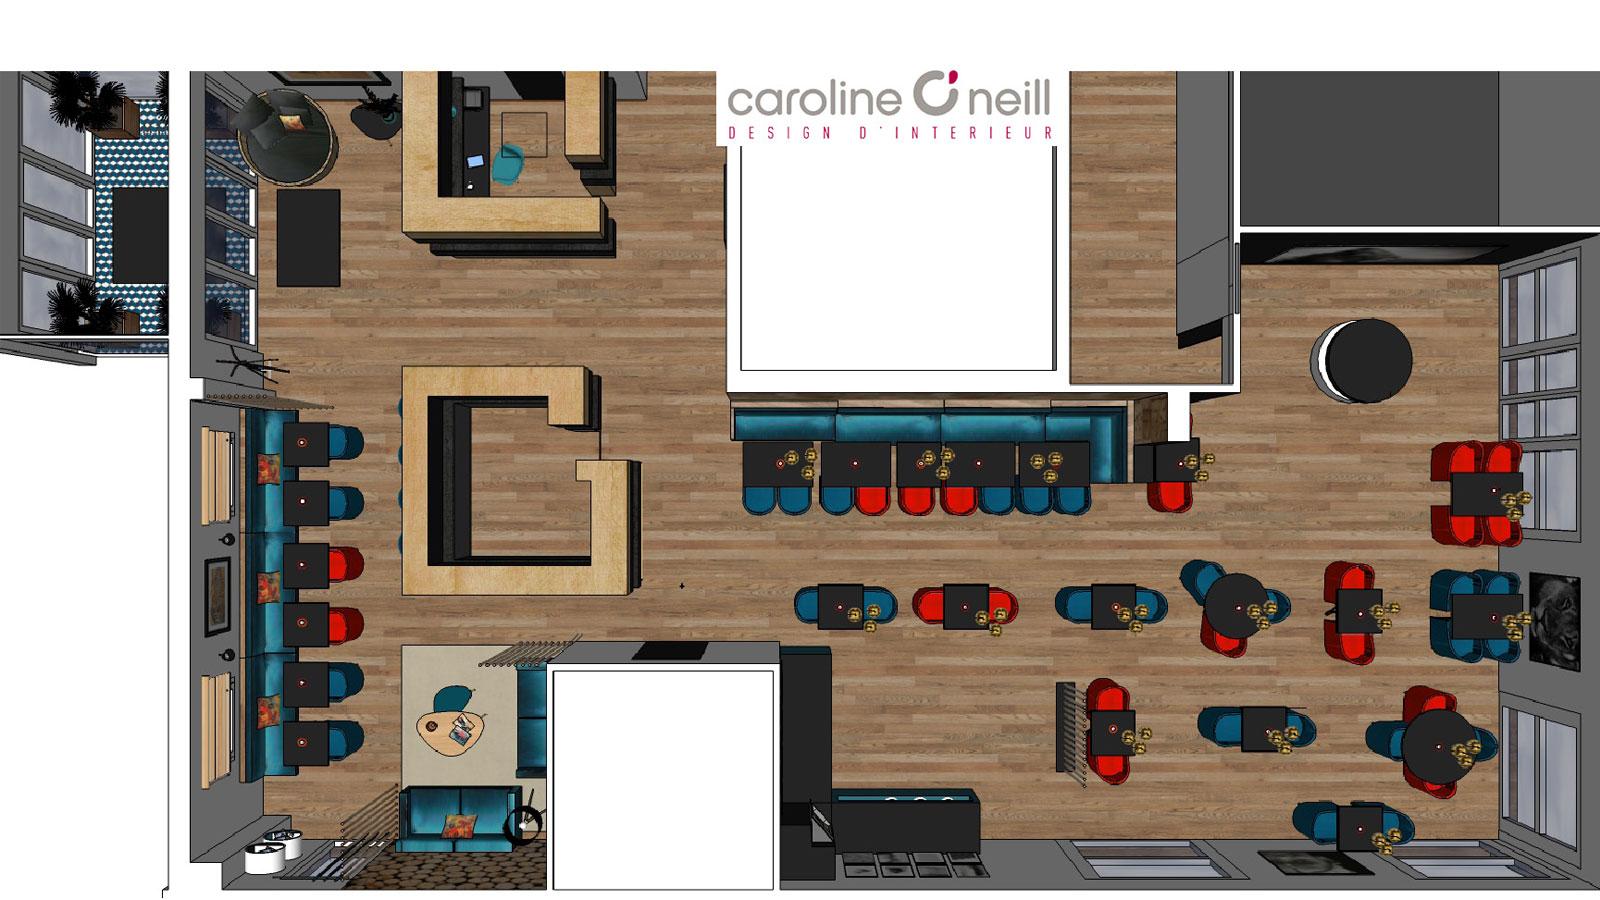 vue de dessus en 3D d'un hôtel restaurant